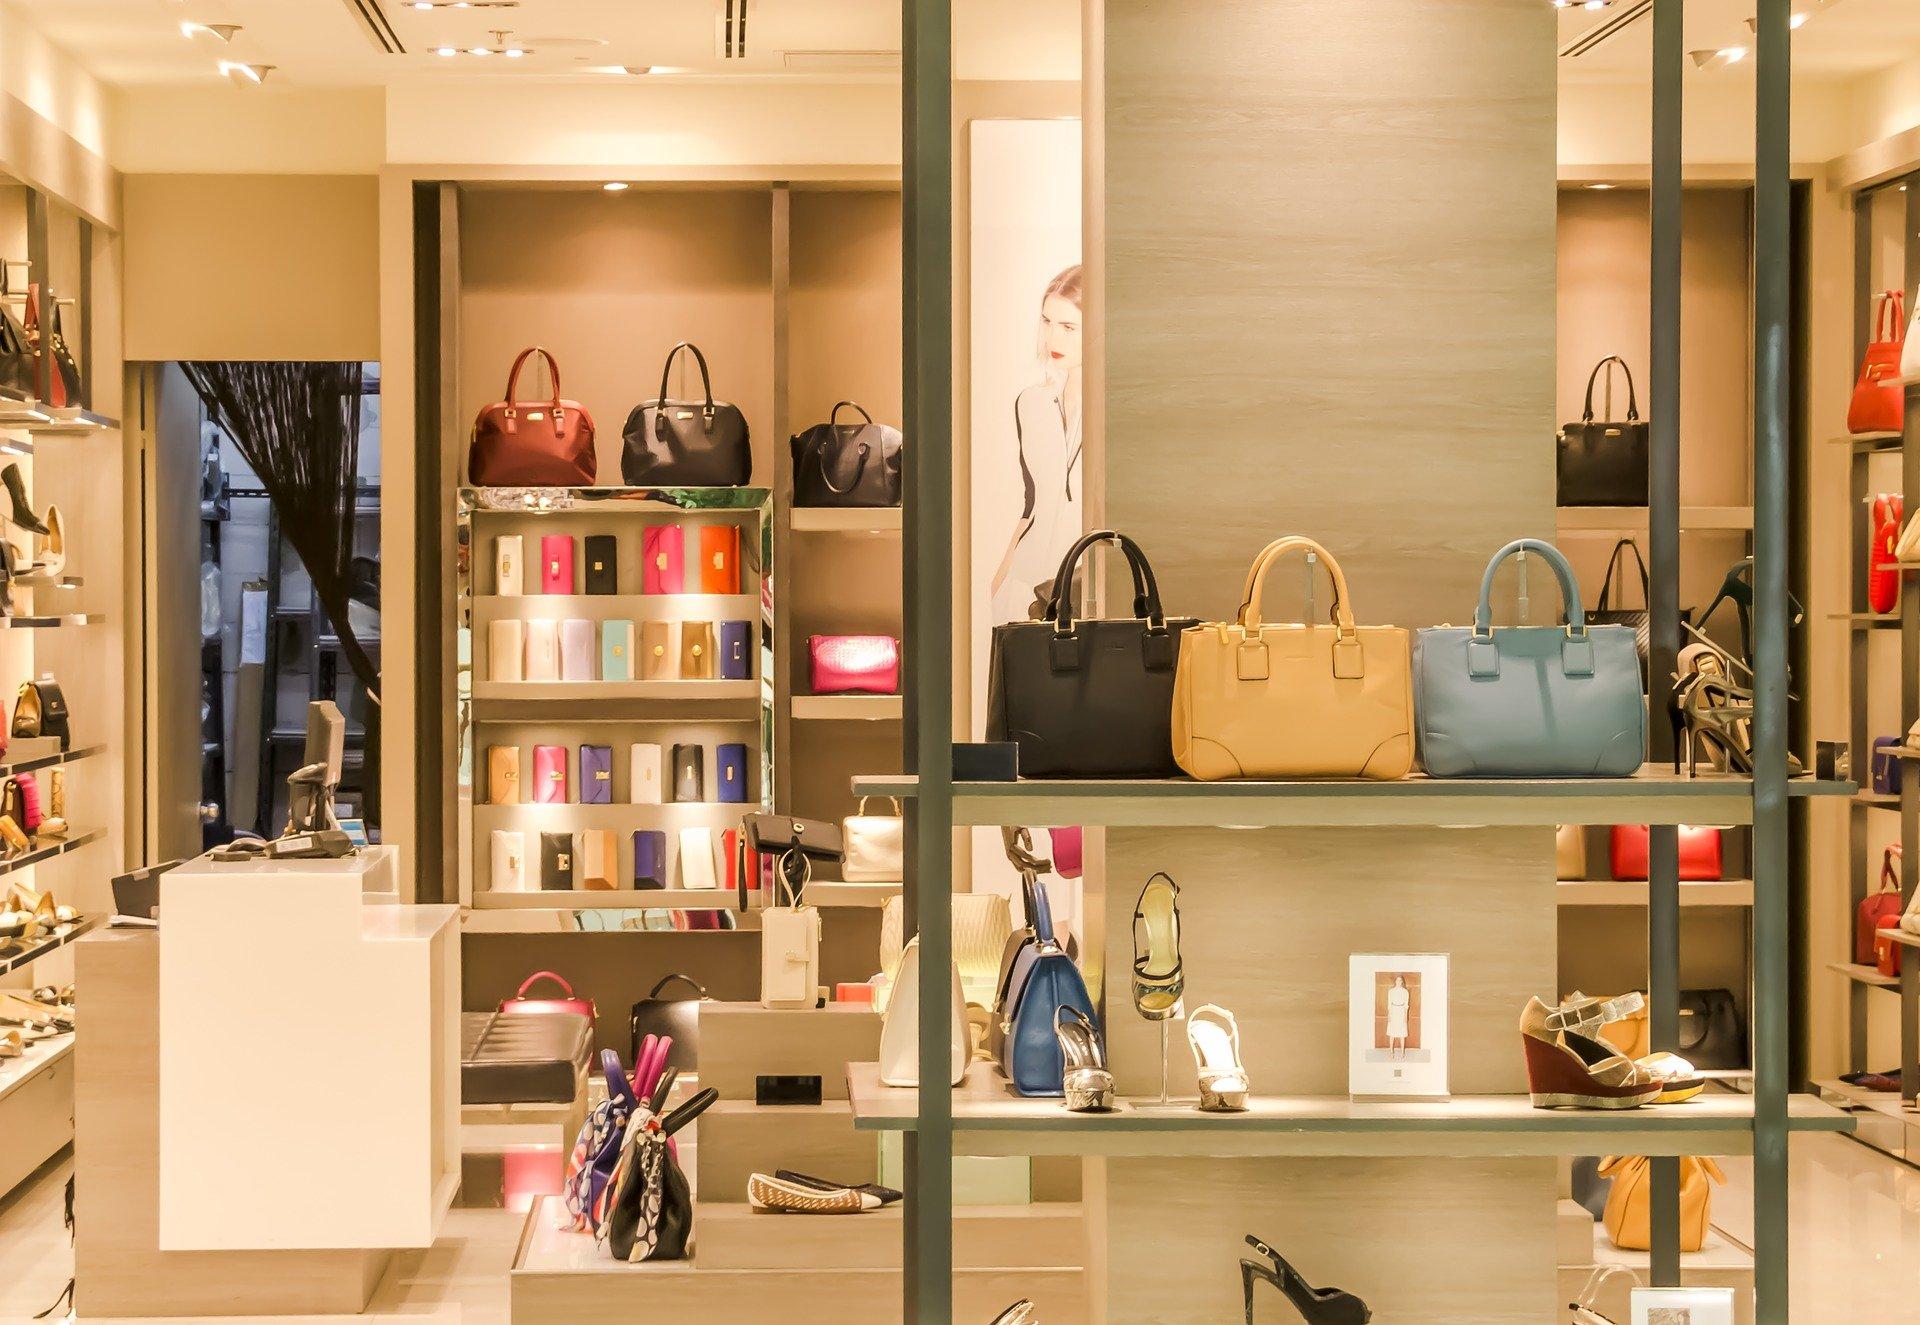 10 Most Popular Designer Bags Ever